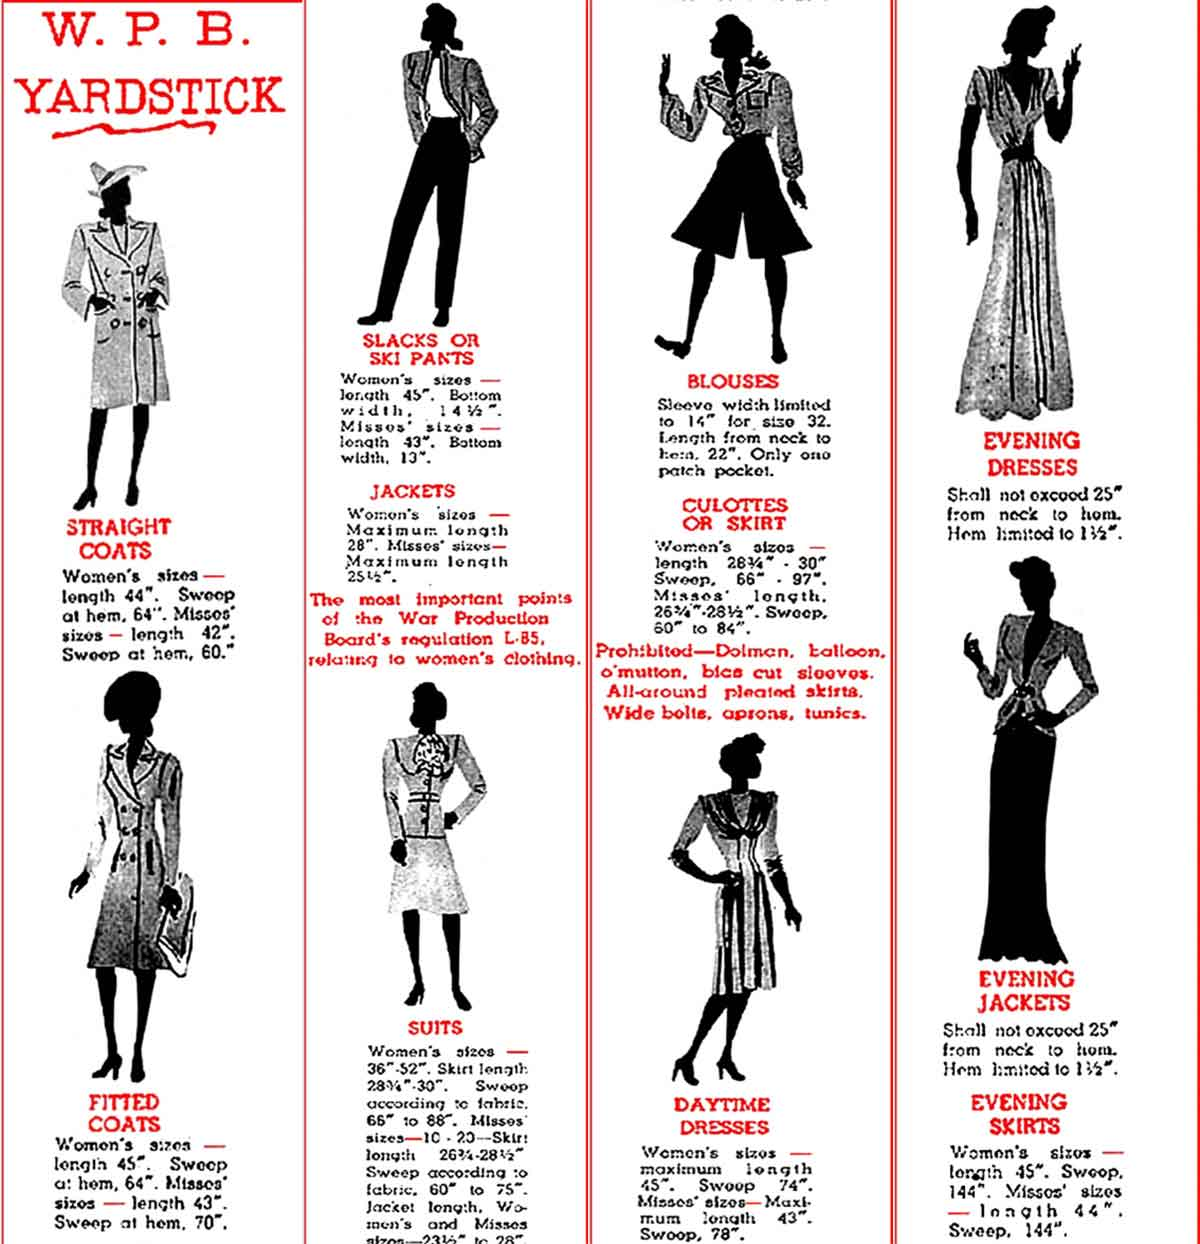 US war-production-board-wpb-clothing-yardstick